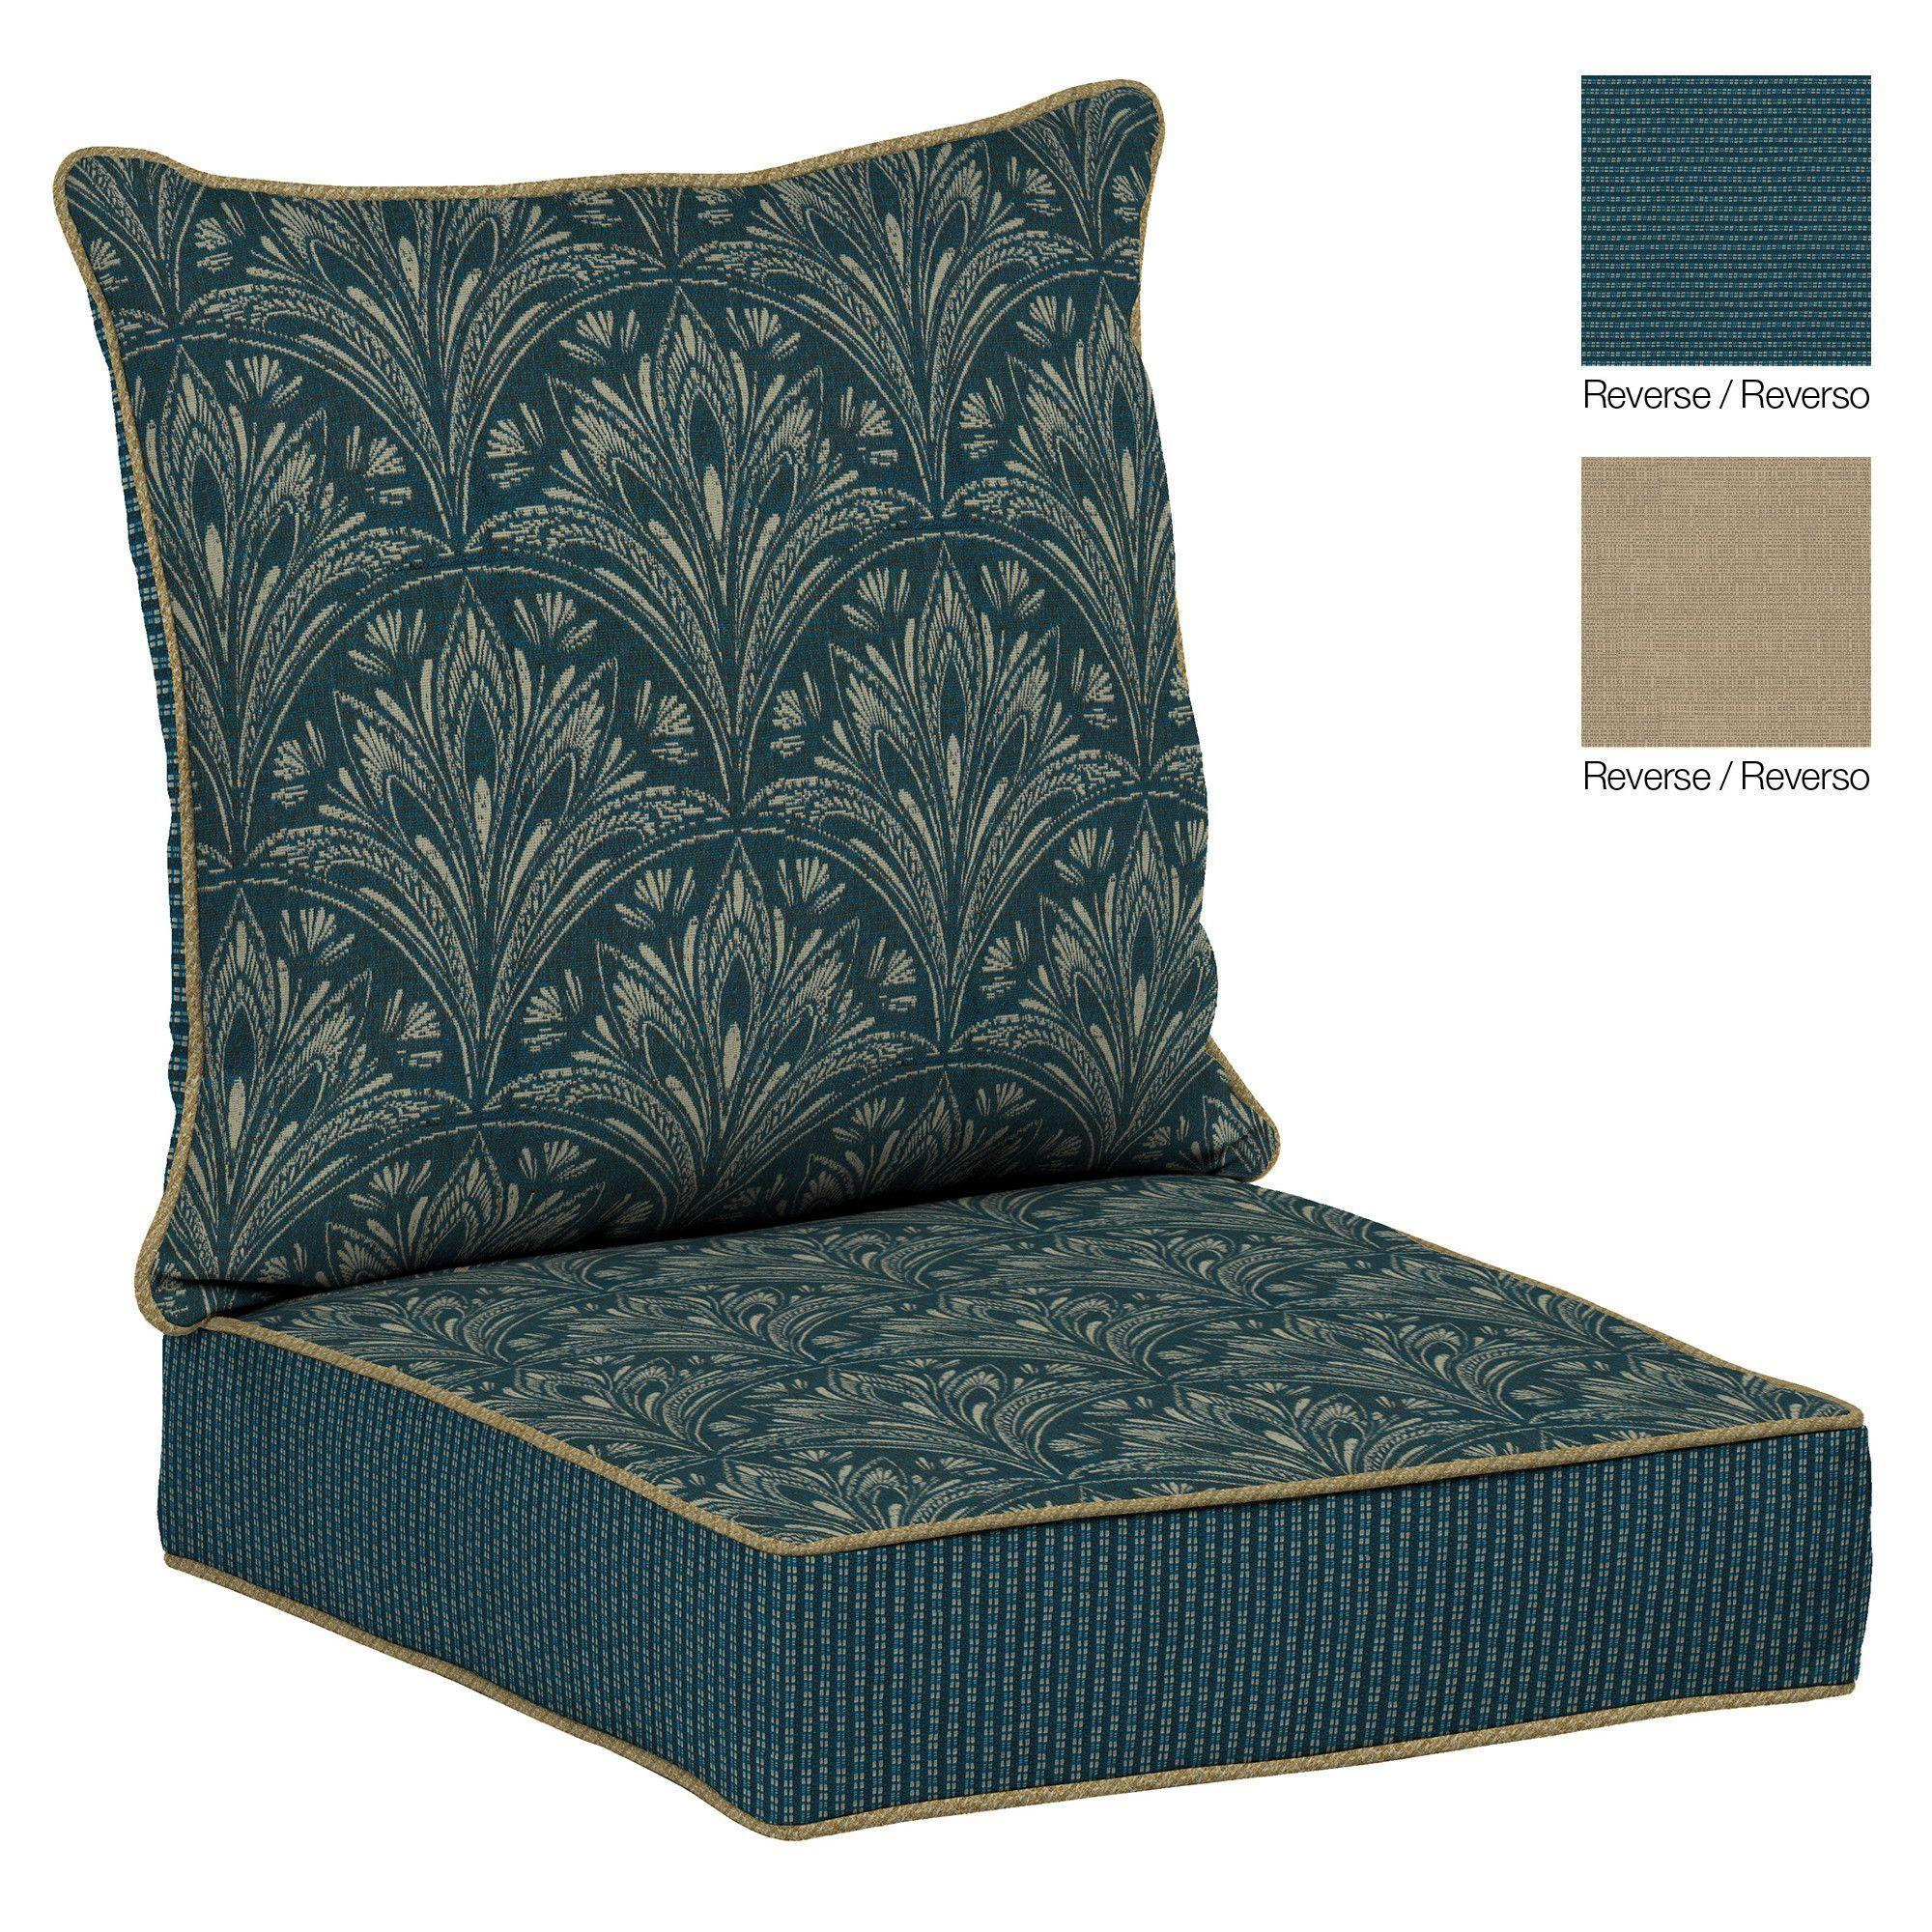 Royal Zanzibar Outdoor Reversible Deep Seat Cushion